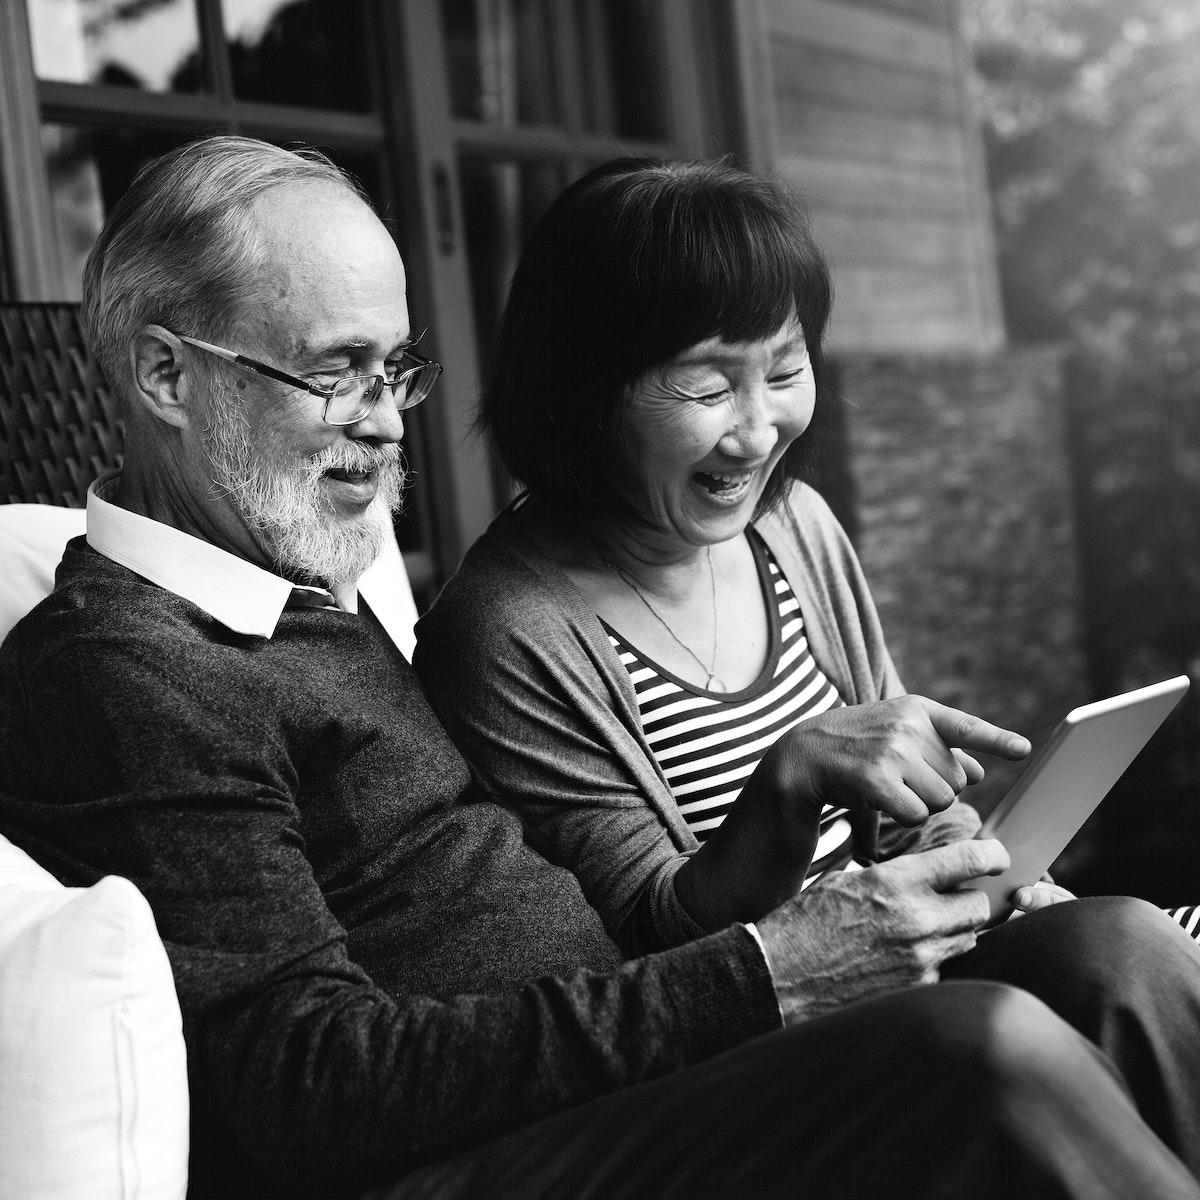 Senior couple sitting using tablet together